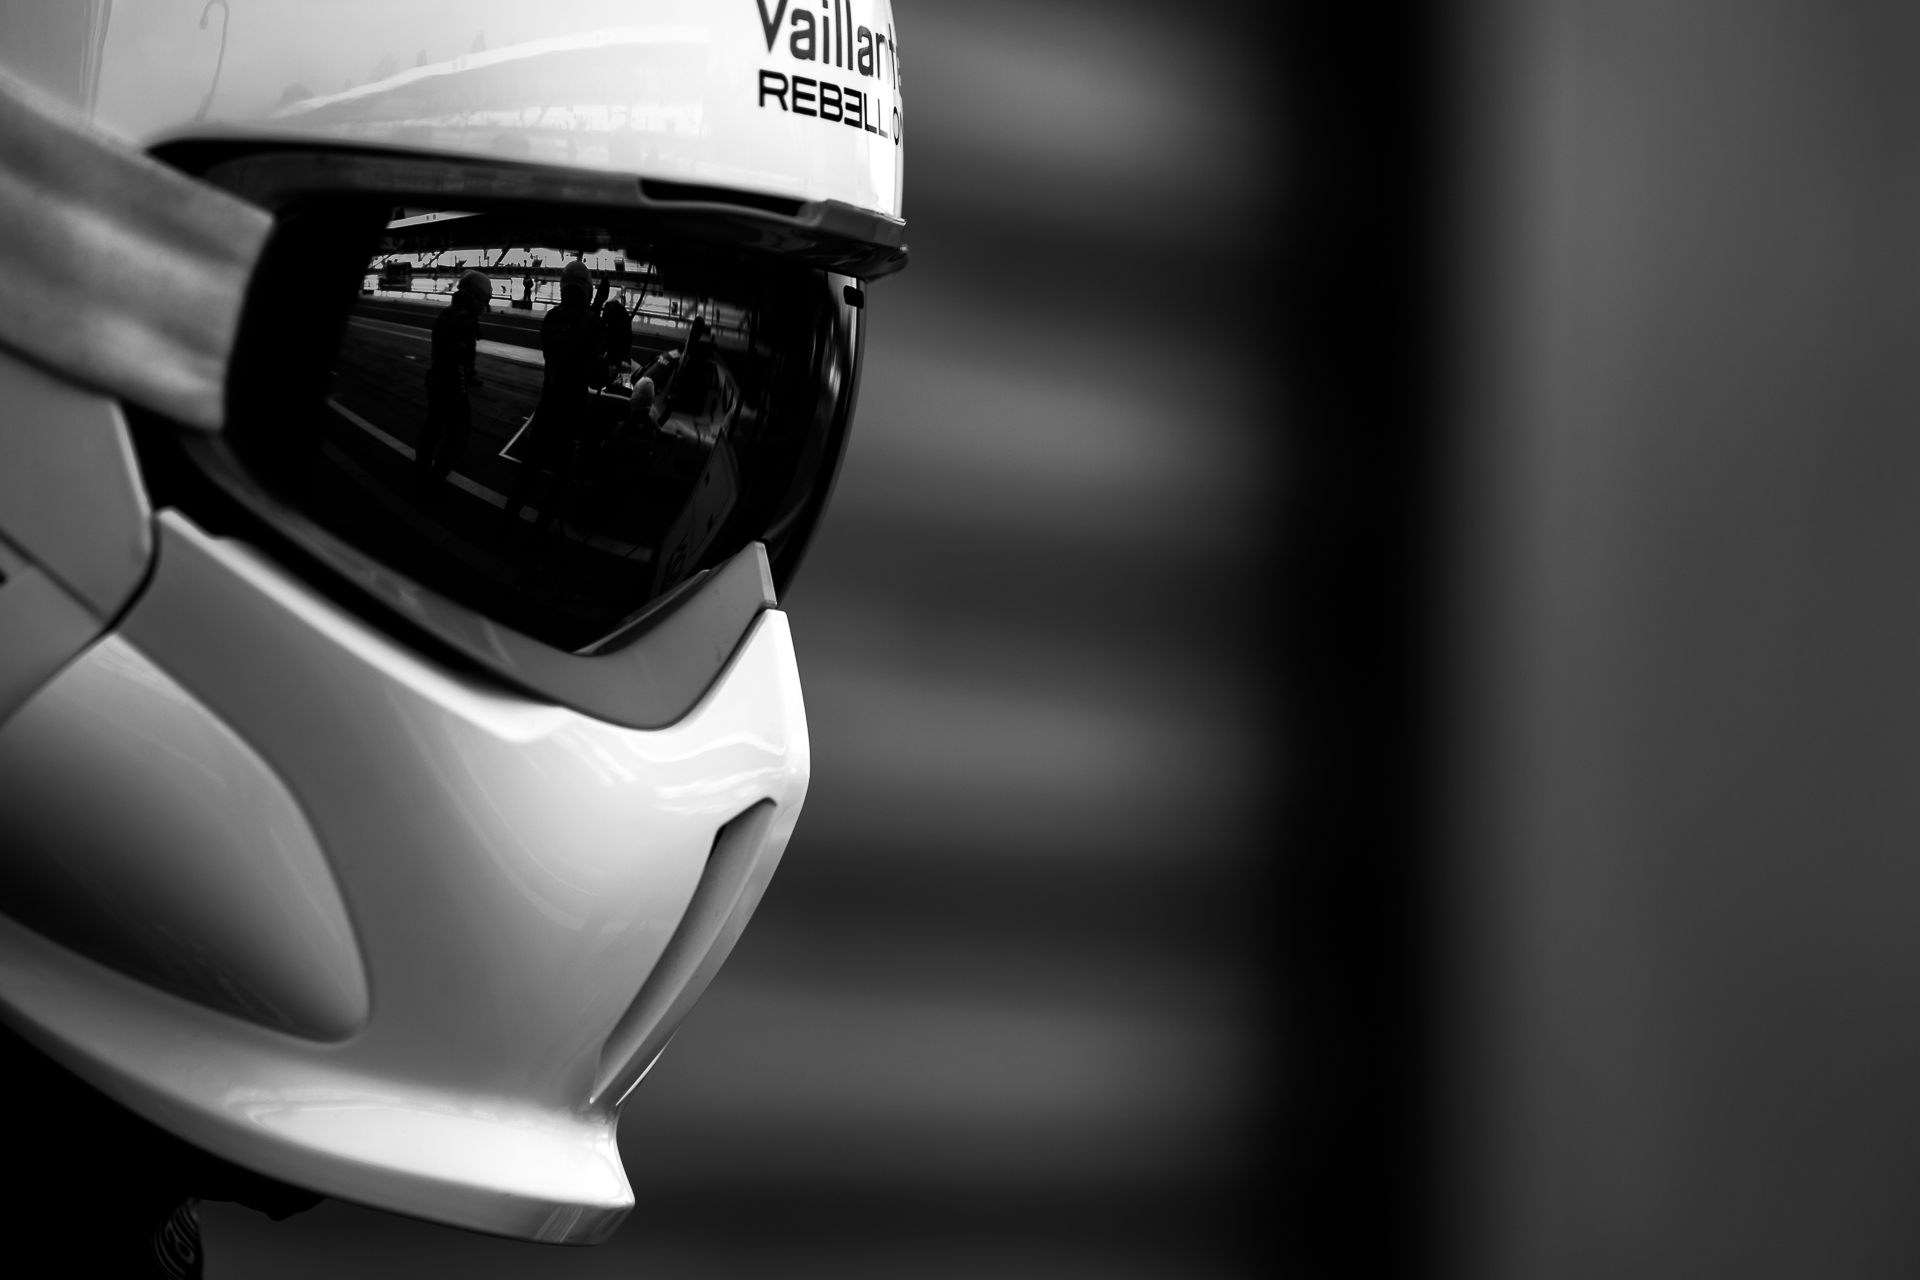 Helmet of an Rebellion // © marcellanger / www.adrenalmedia.com